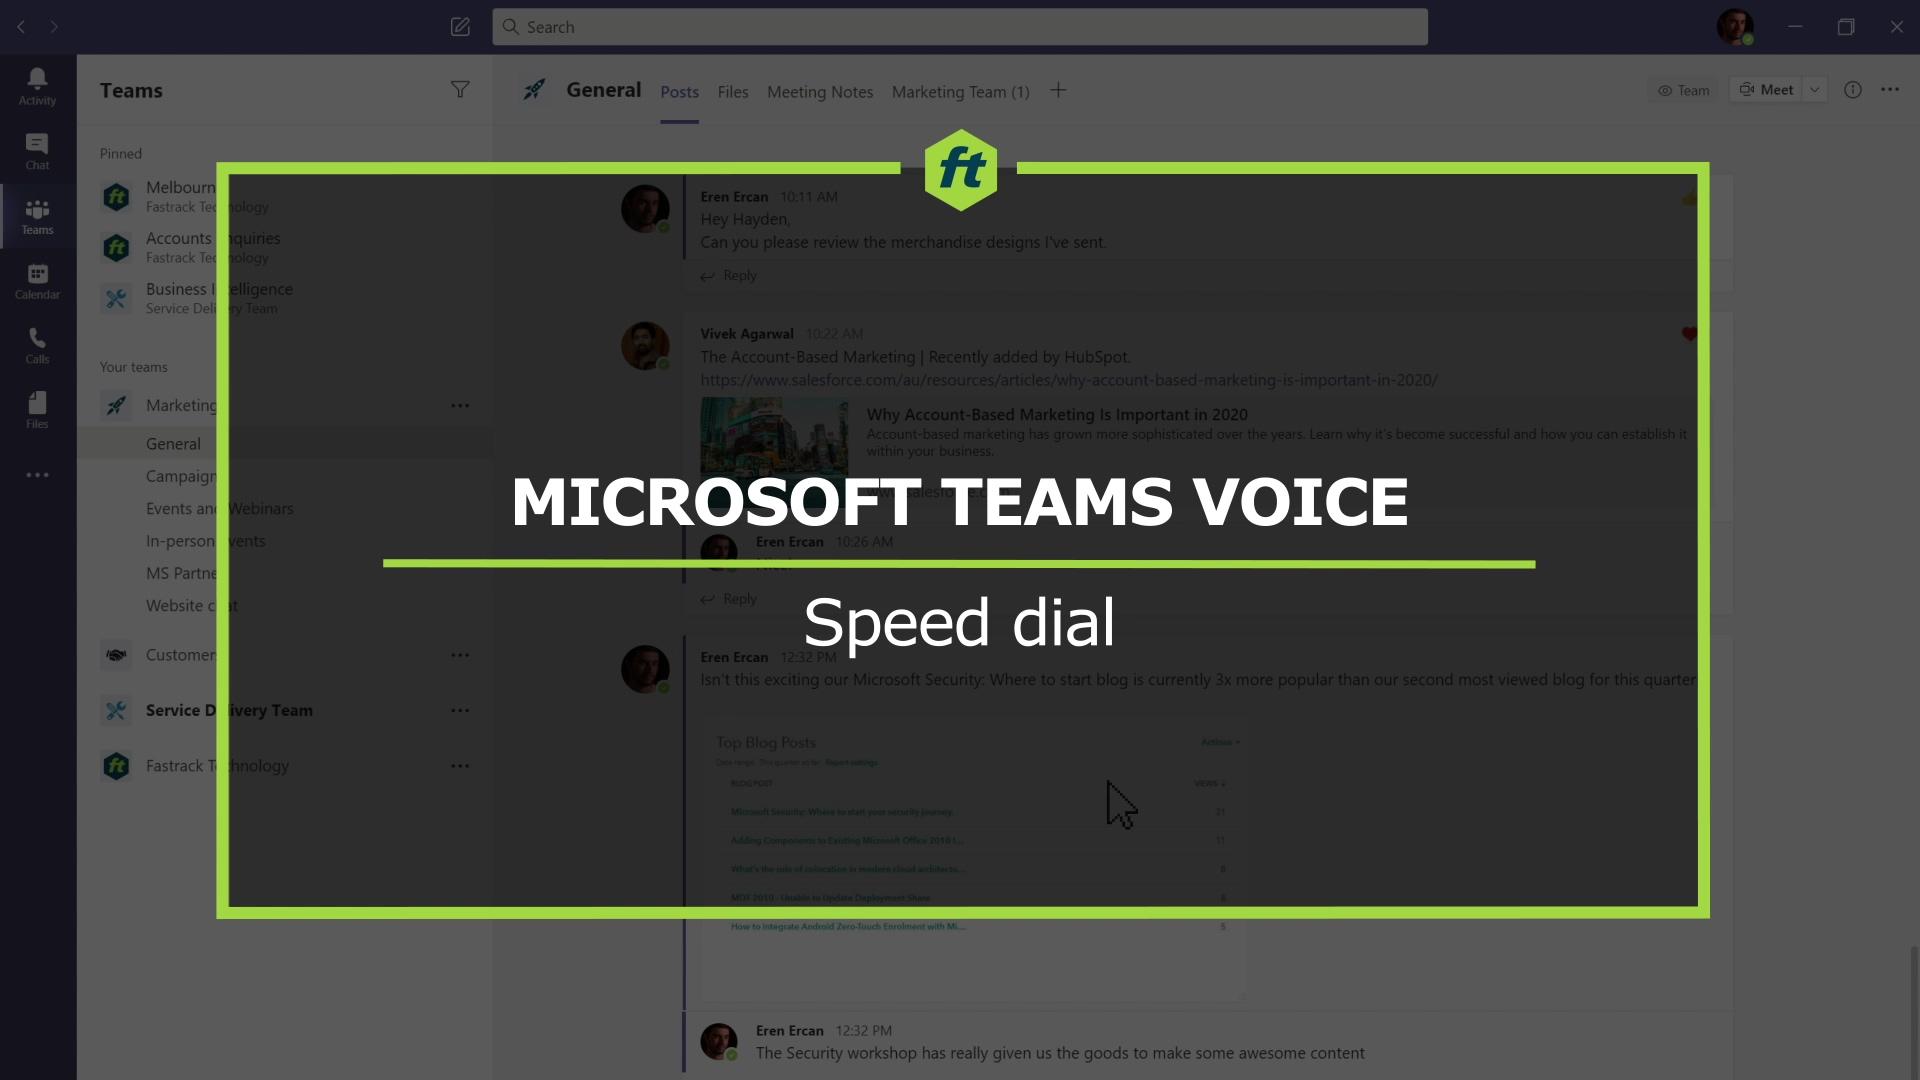 MTV - Speed dial